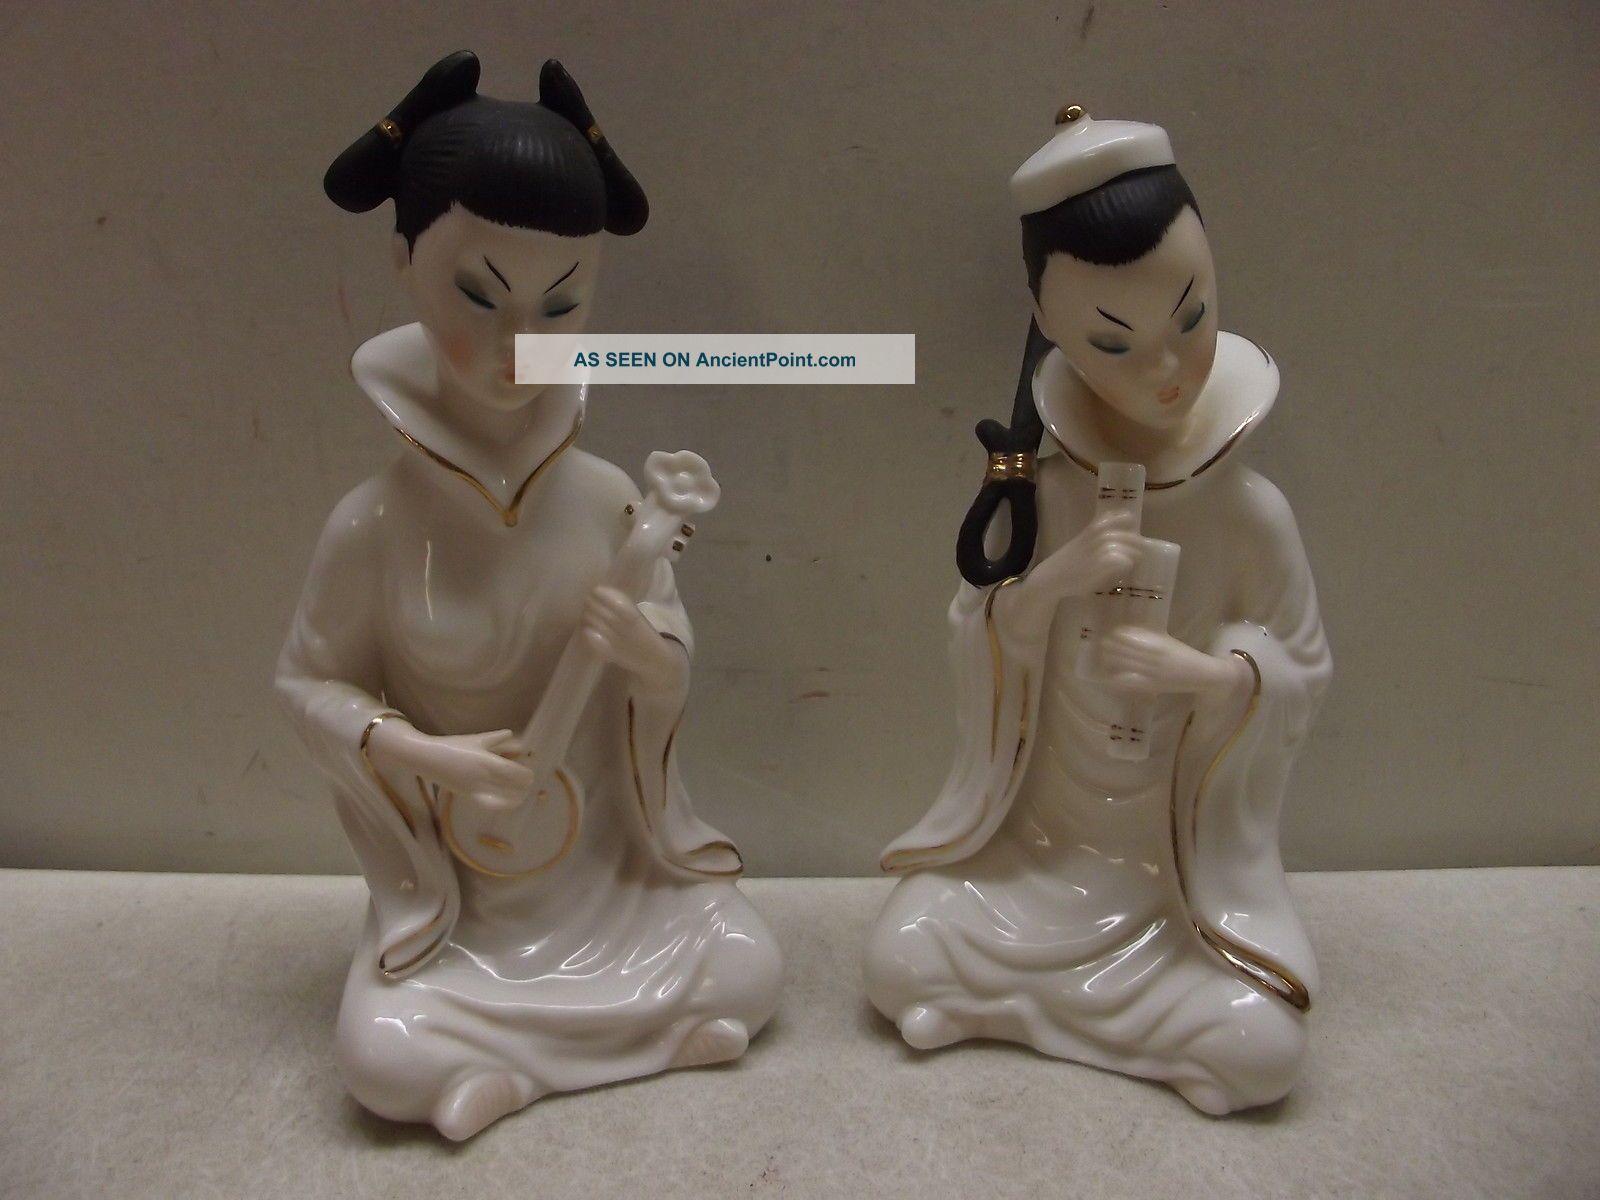 Vintage Lenwile Ardalt Porcelain Japanese Woman Figures Figurines Figurines photo